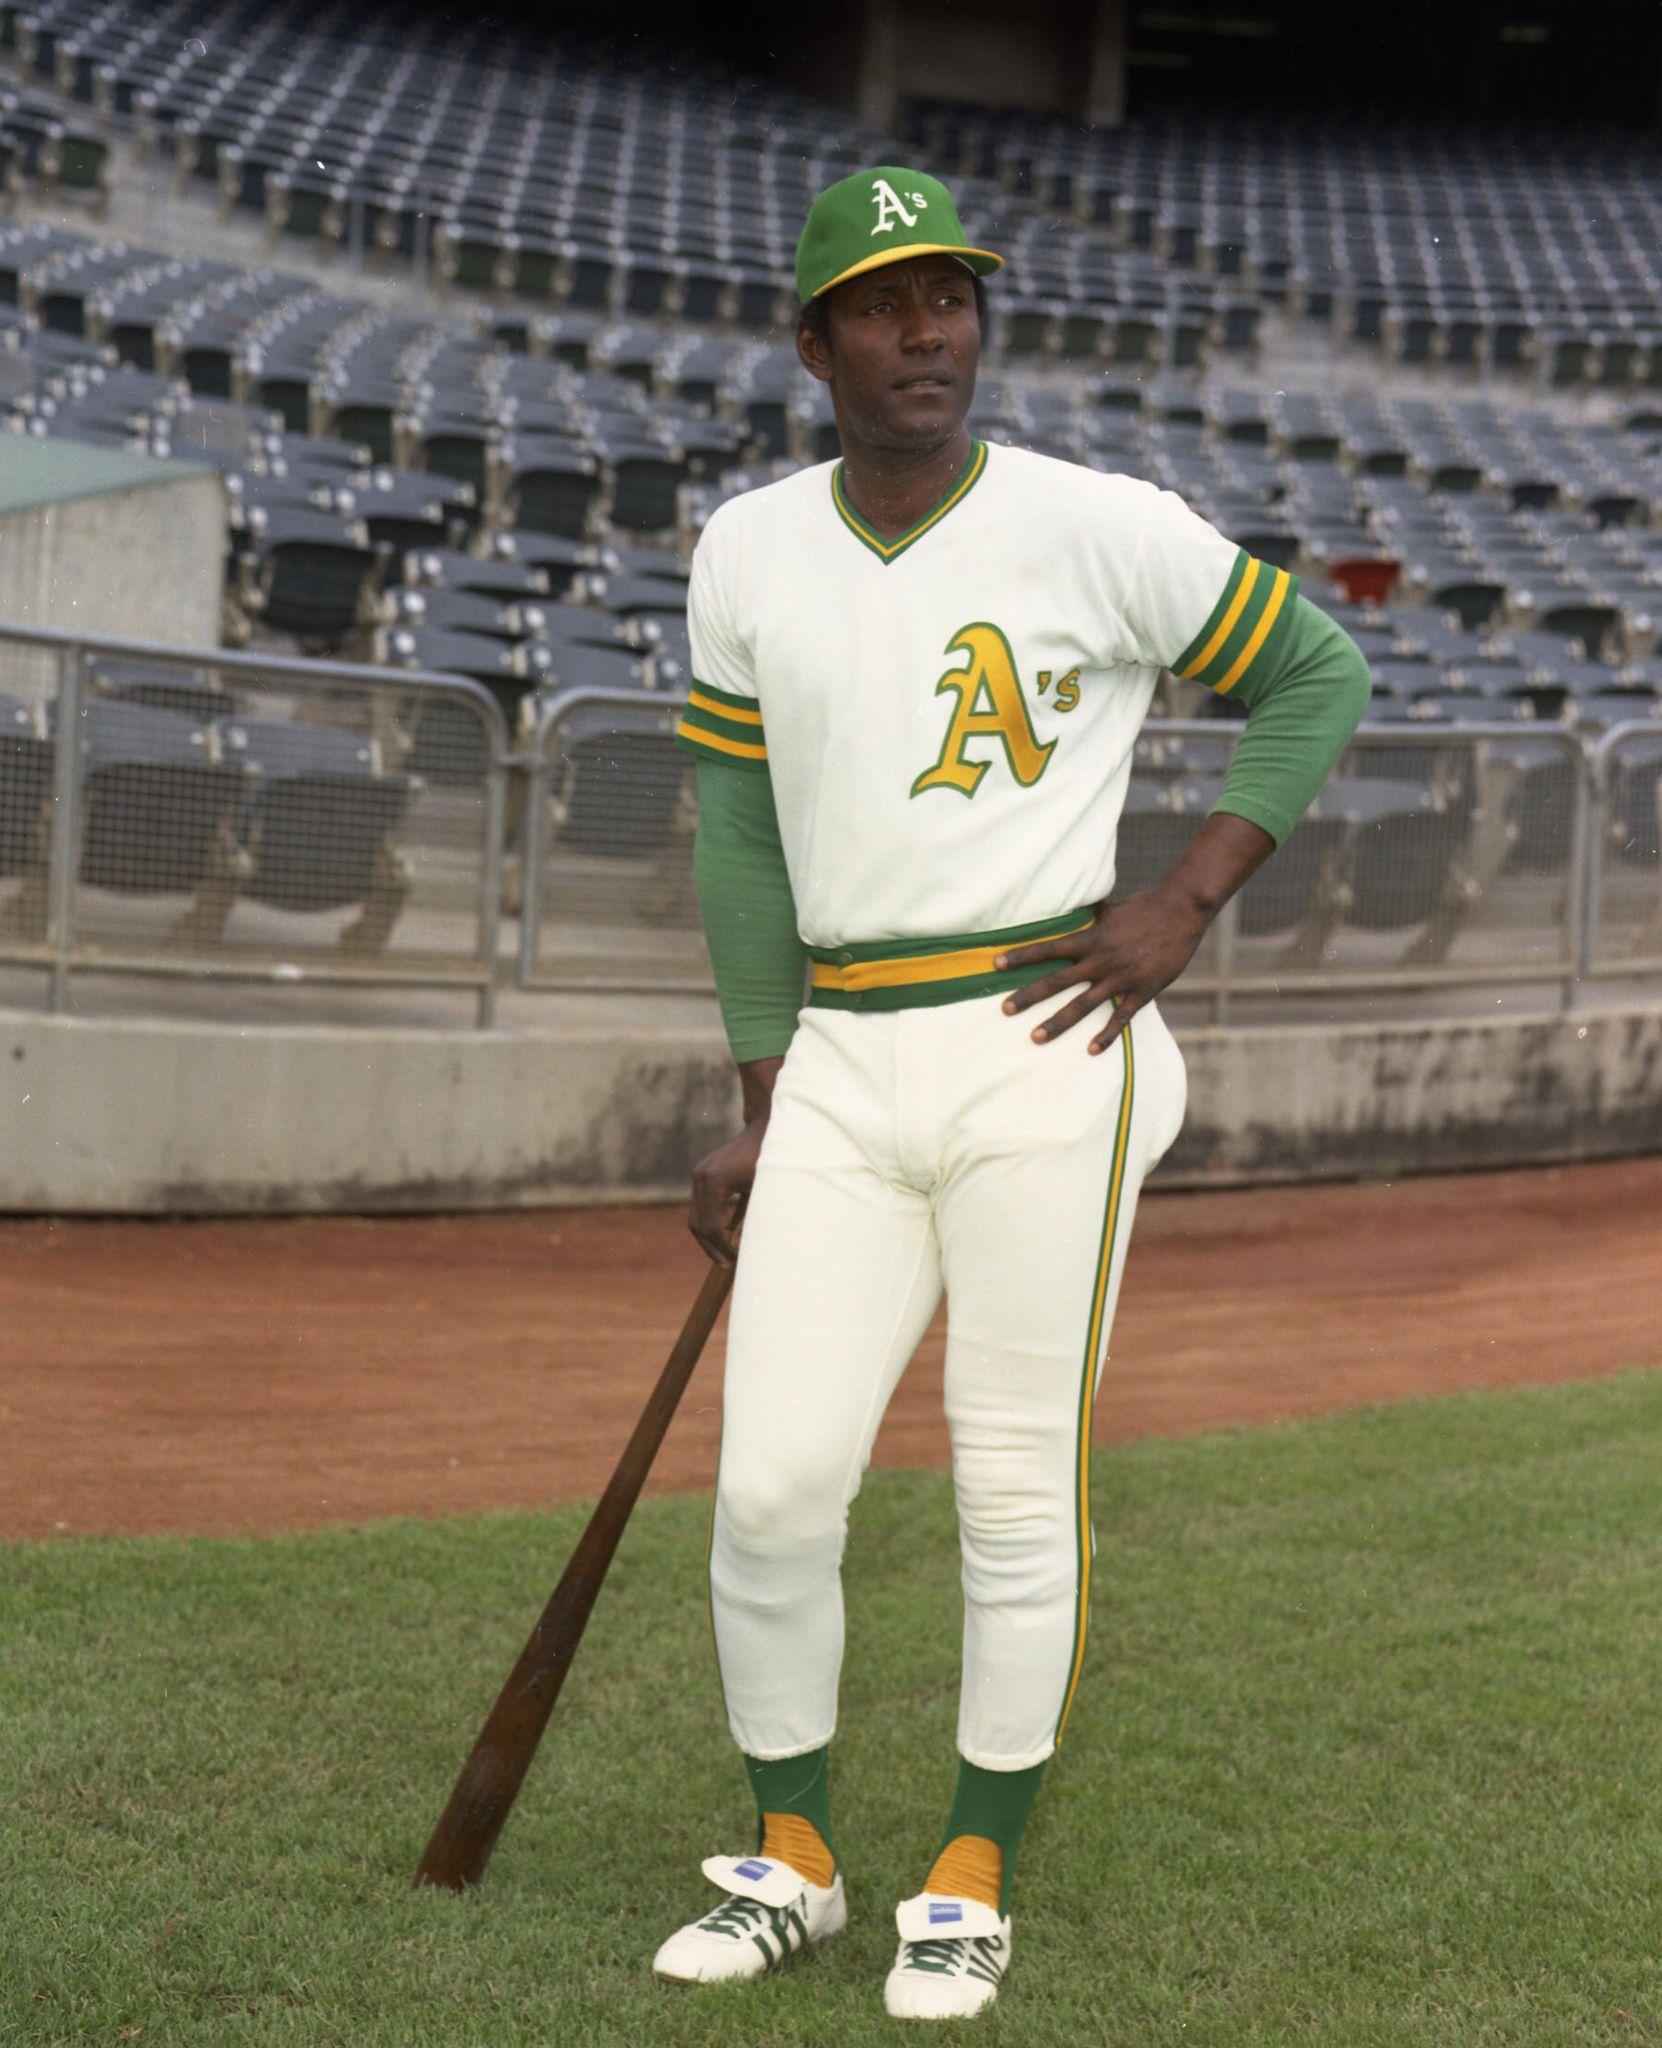 Rico Carty Oakland A S Major League Baseball Stadiums Athletics Baseball Baseball Star